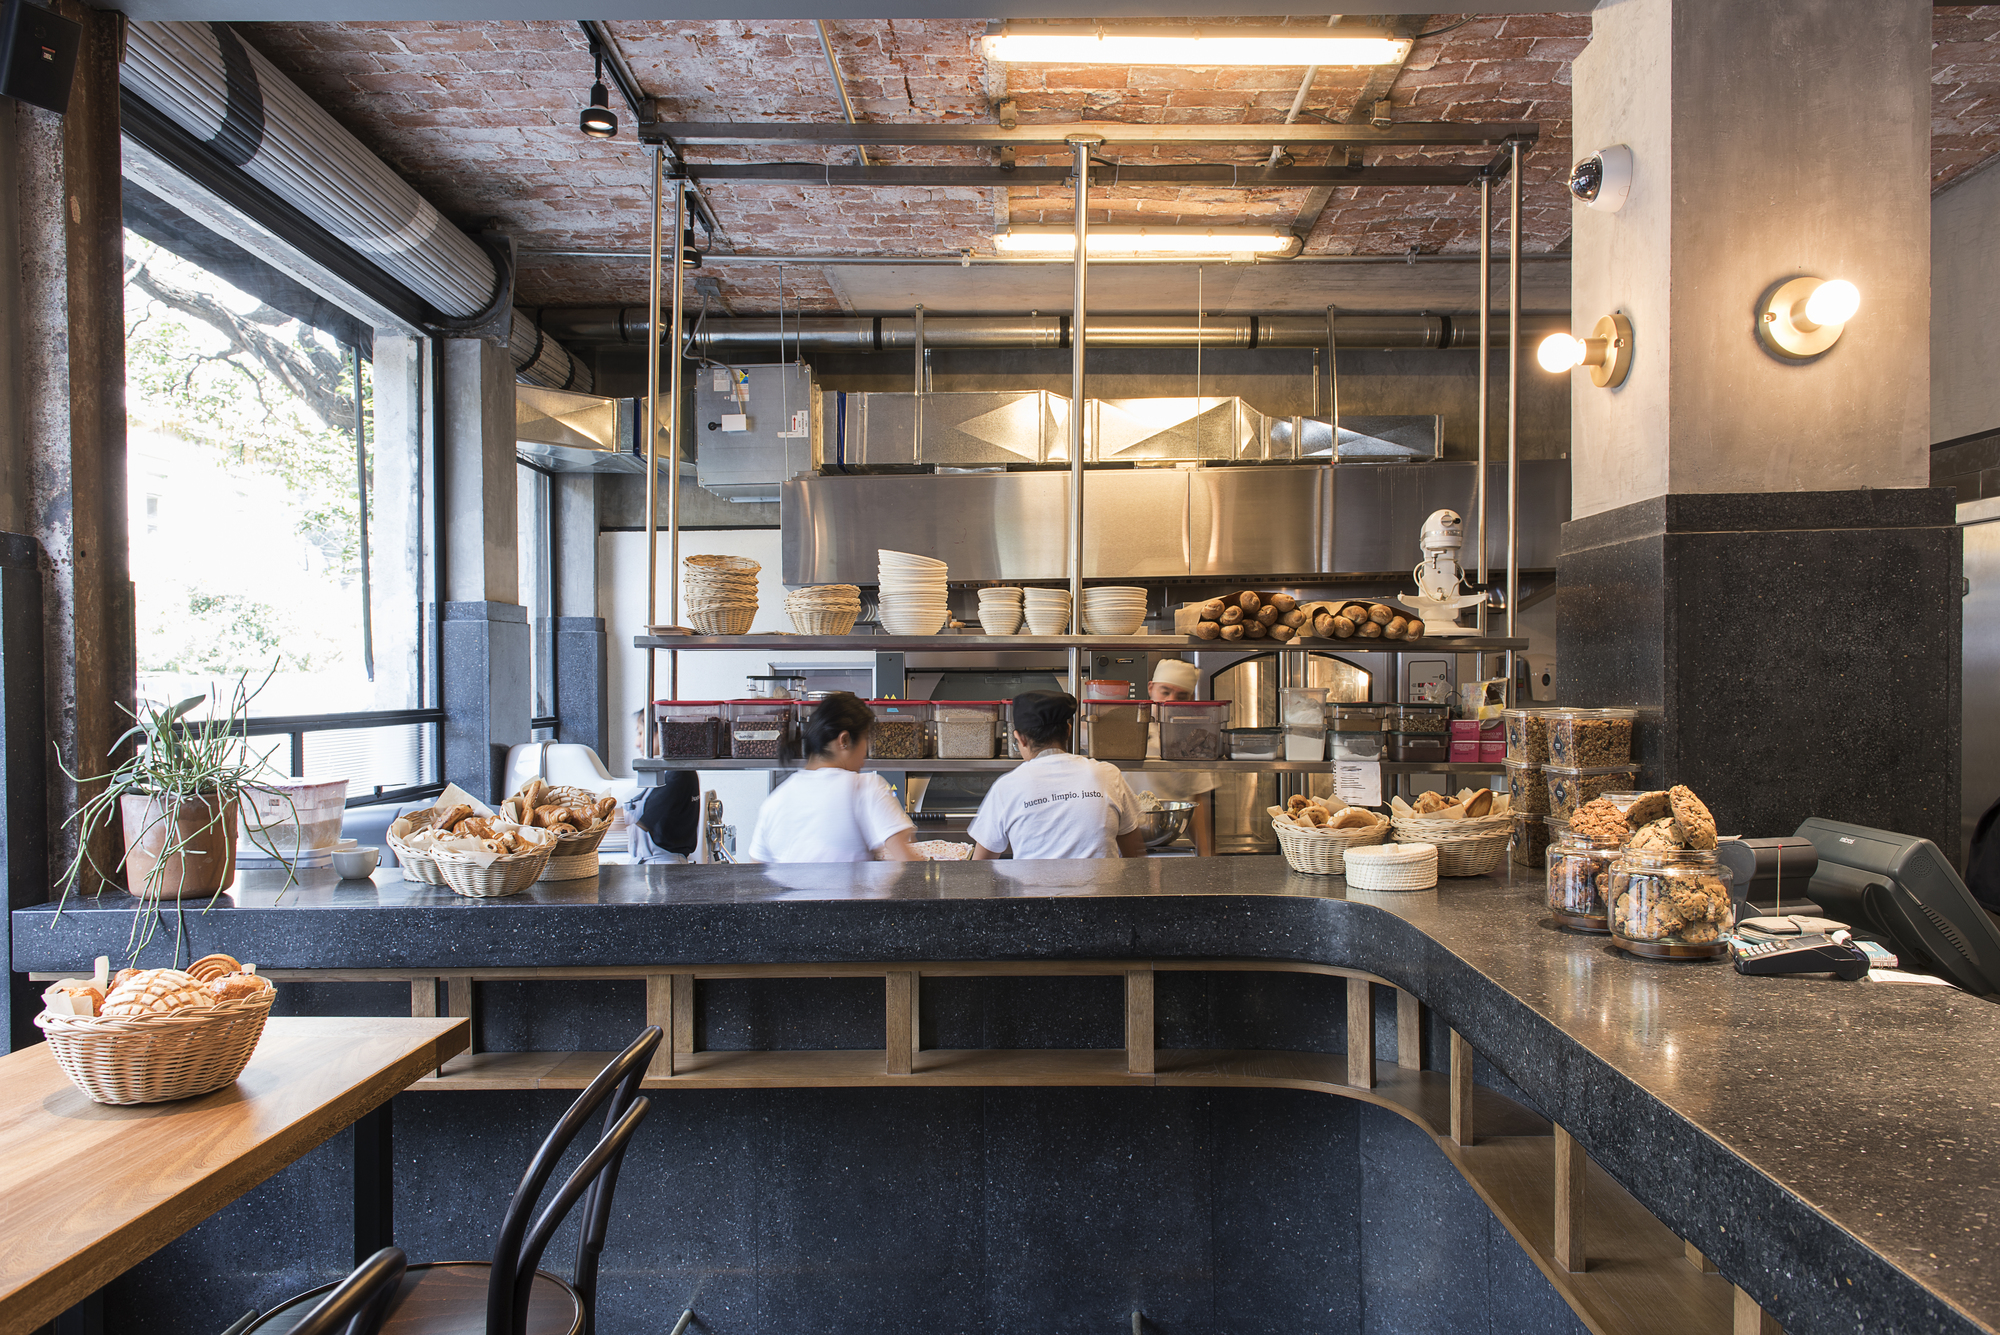 Restaurante eno jsa plataforma arquitectura for Restaurante arquitectura